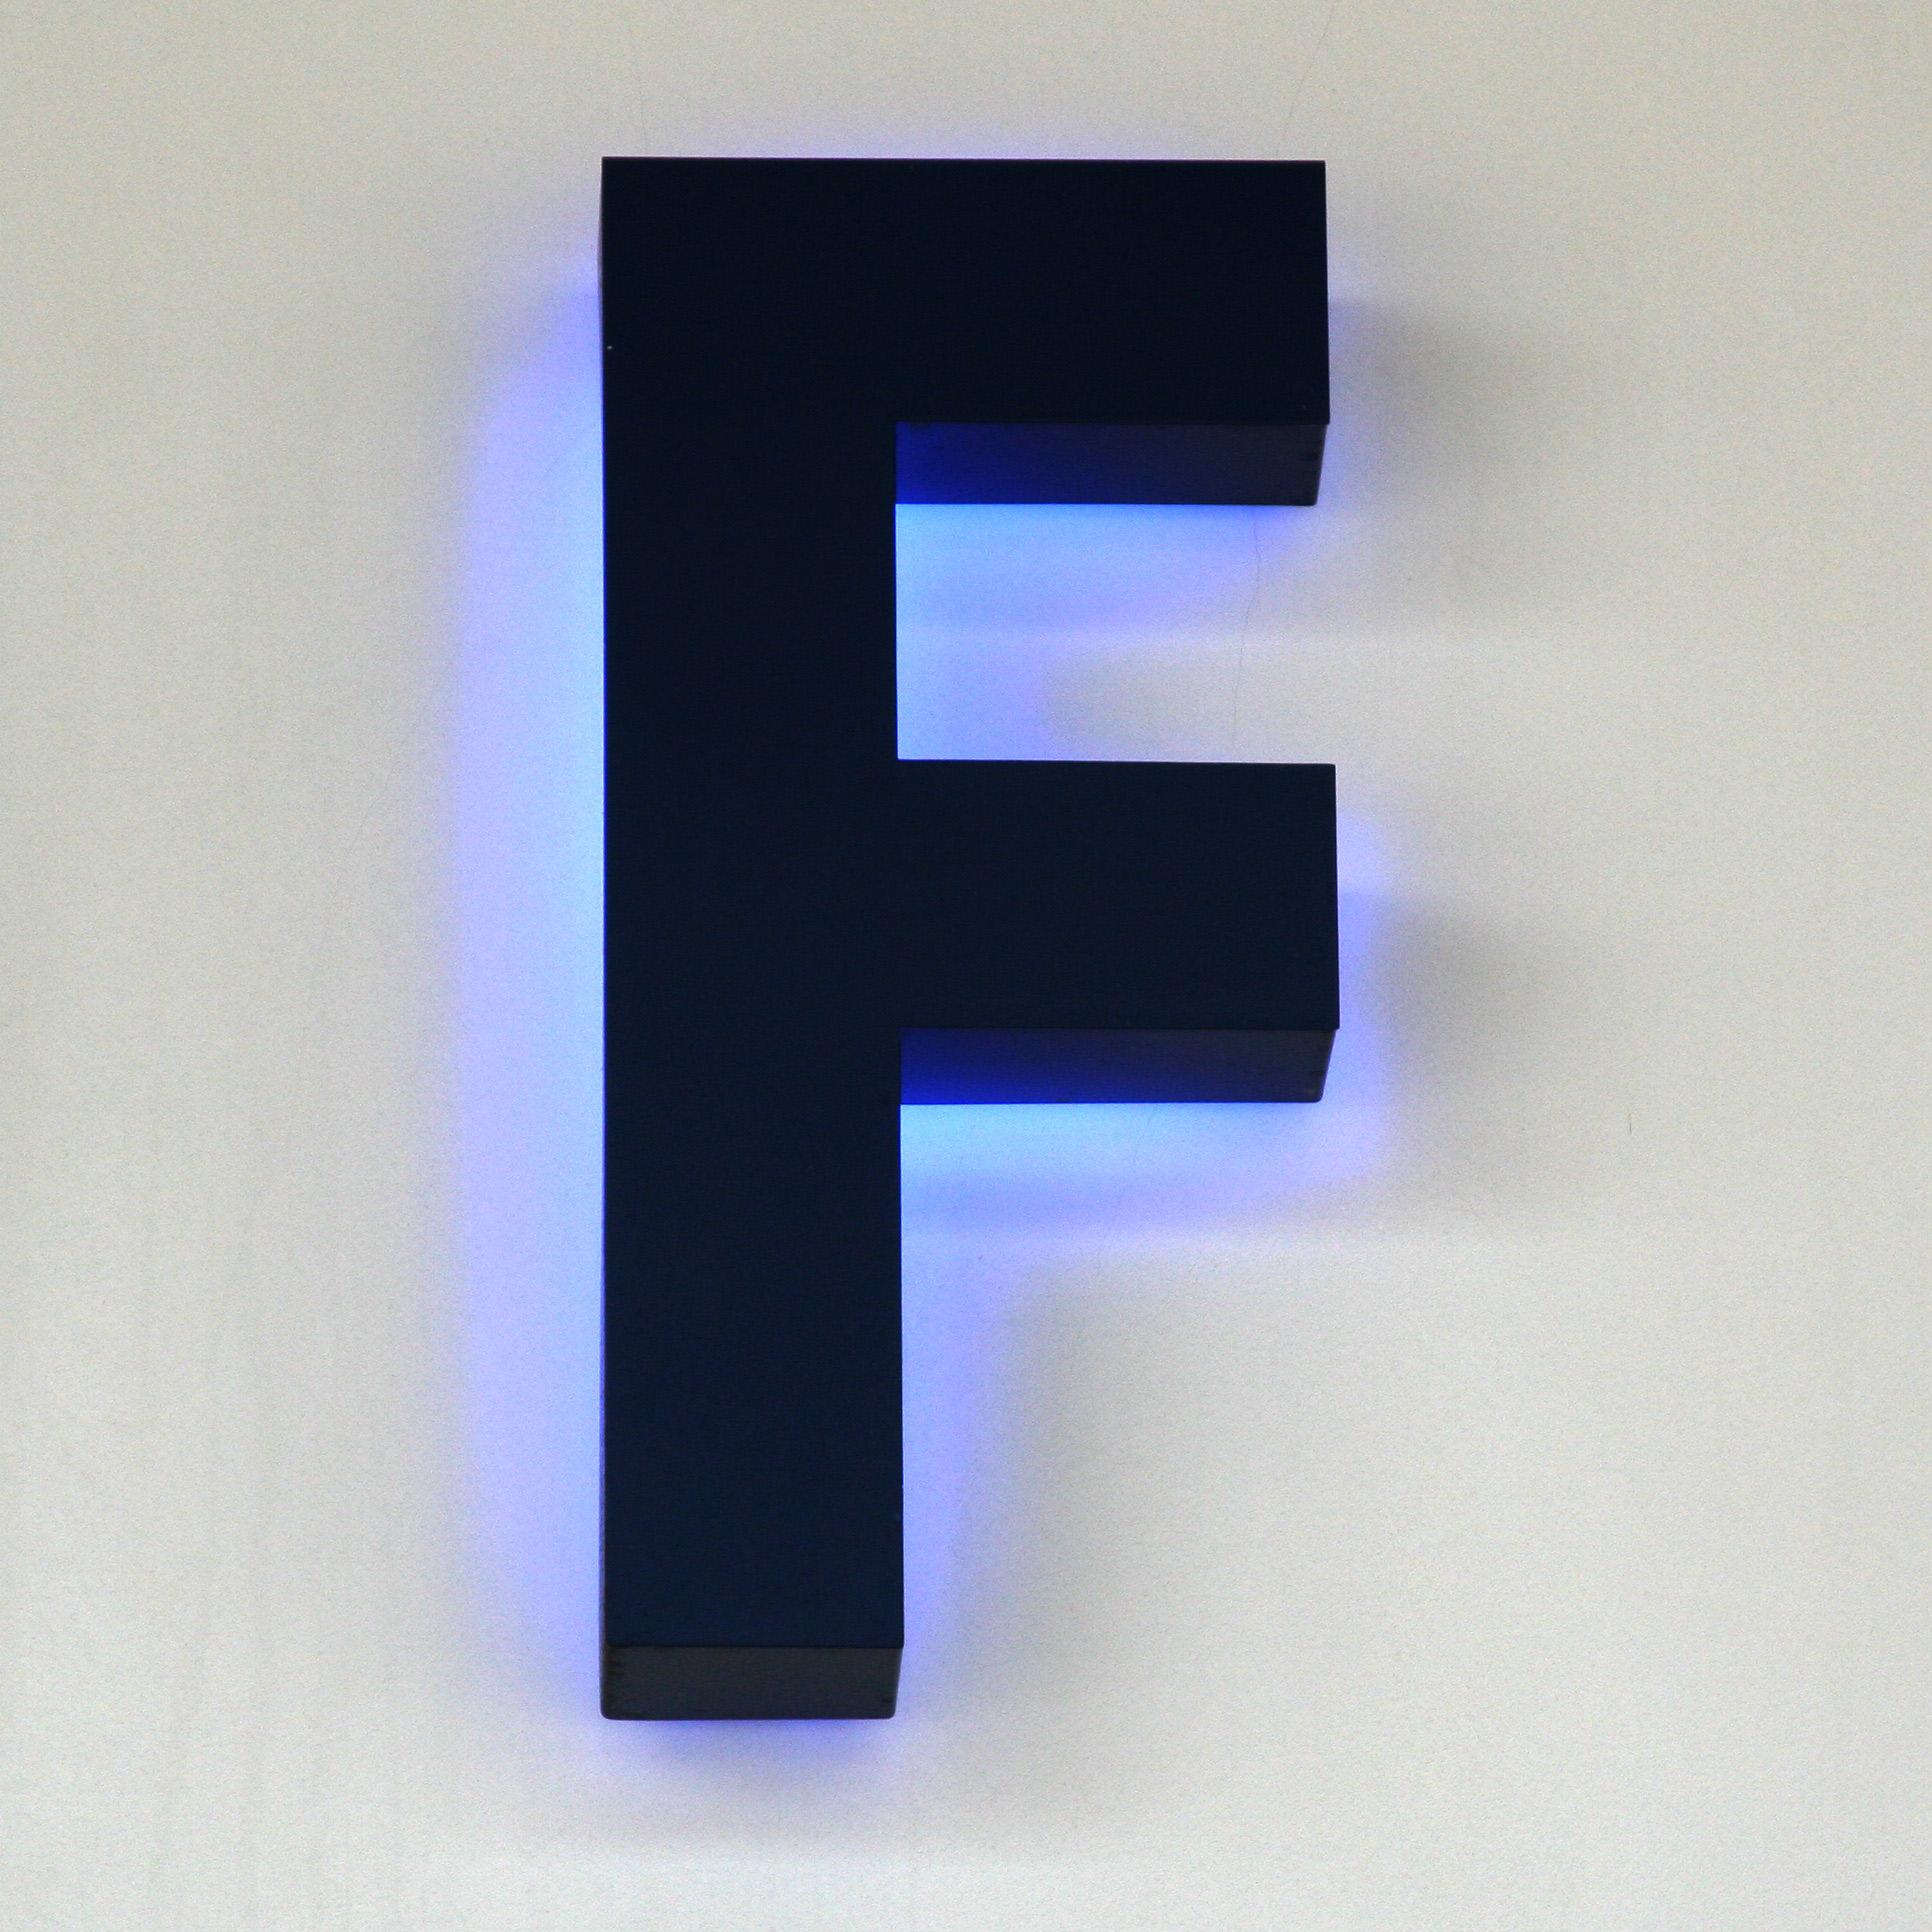 بالصور صور حرف f , كولكشن رائع عن حرف F 3141 6